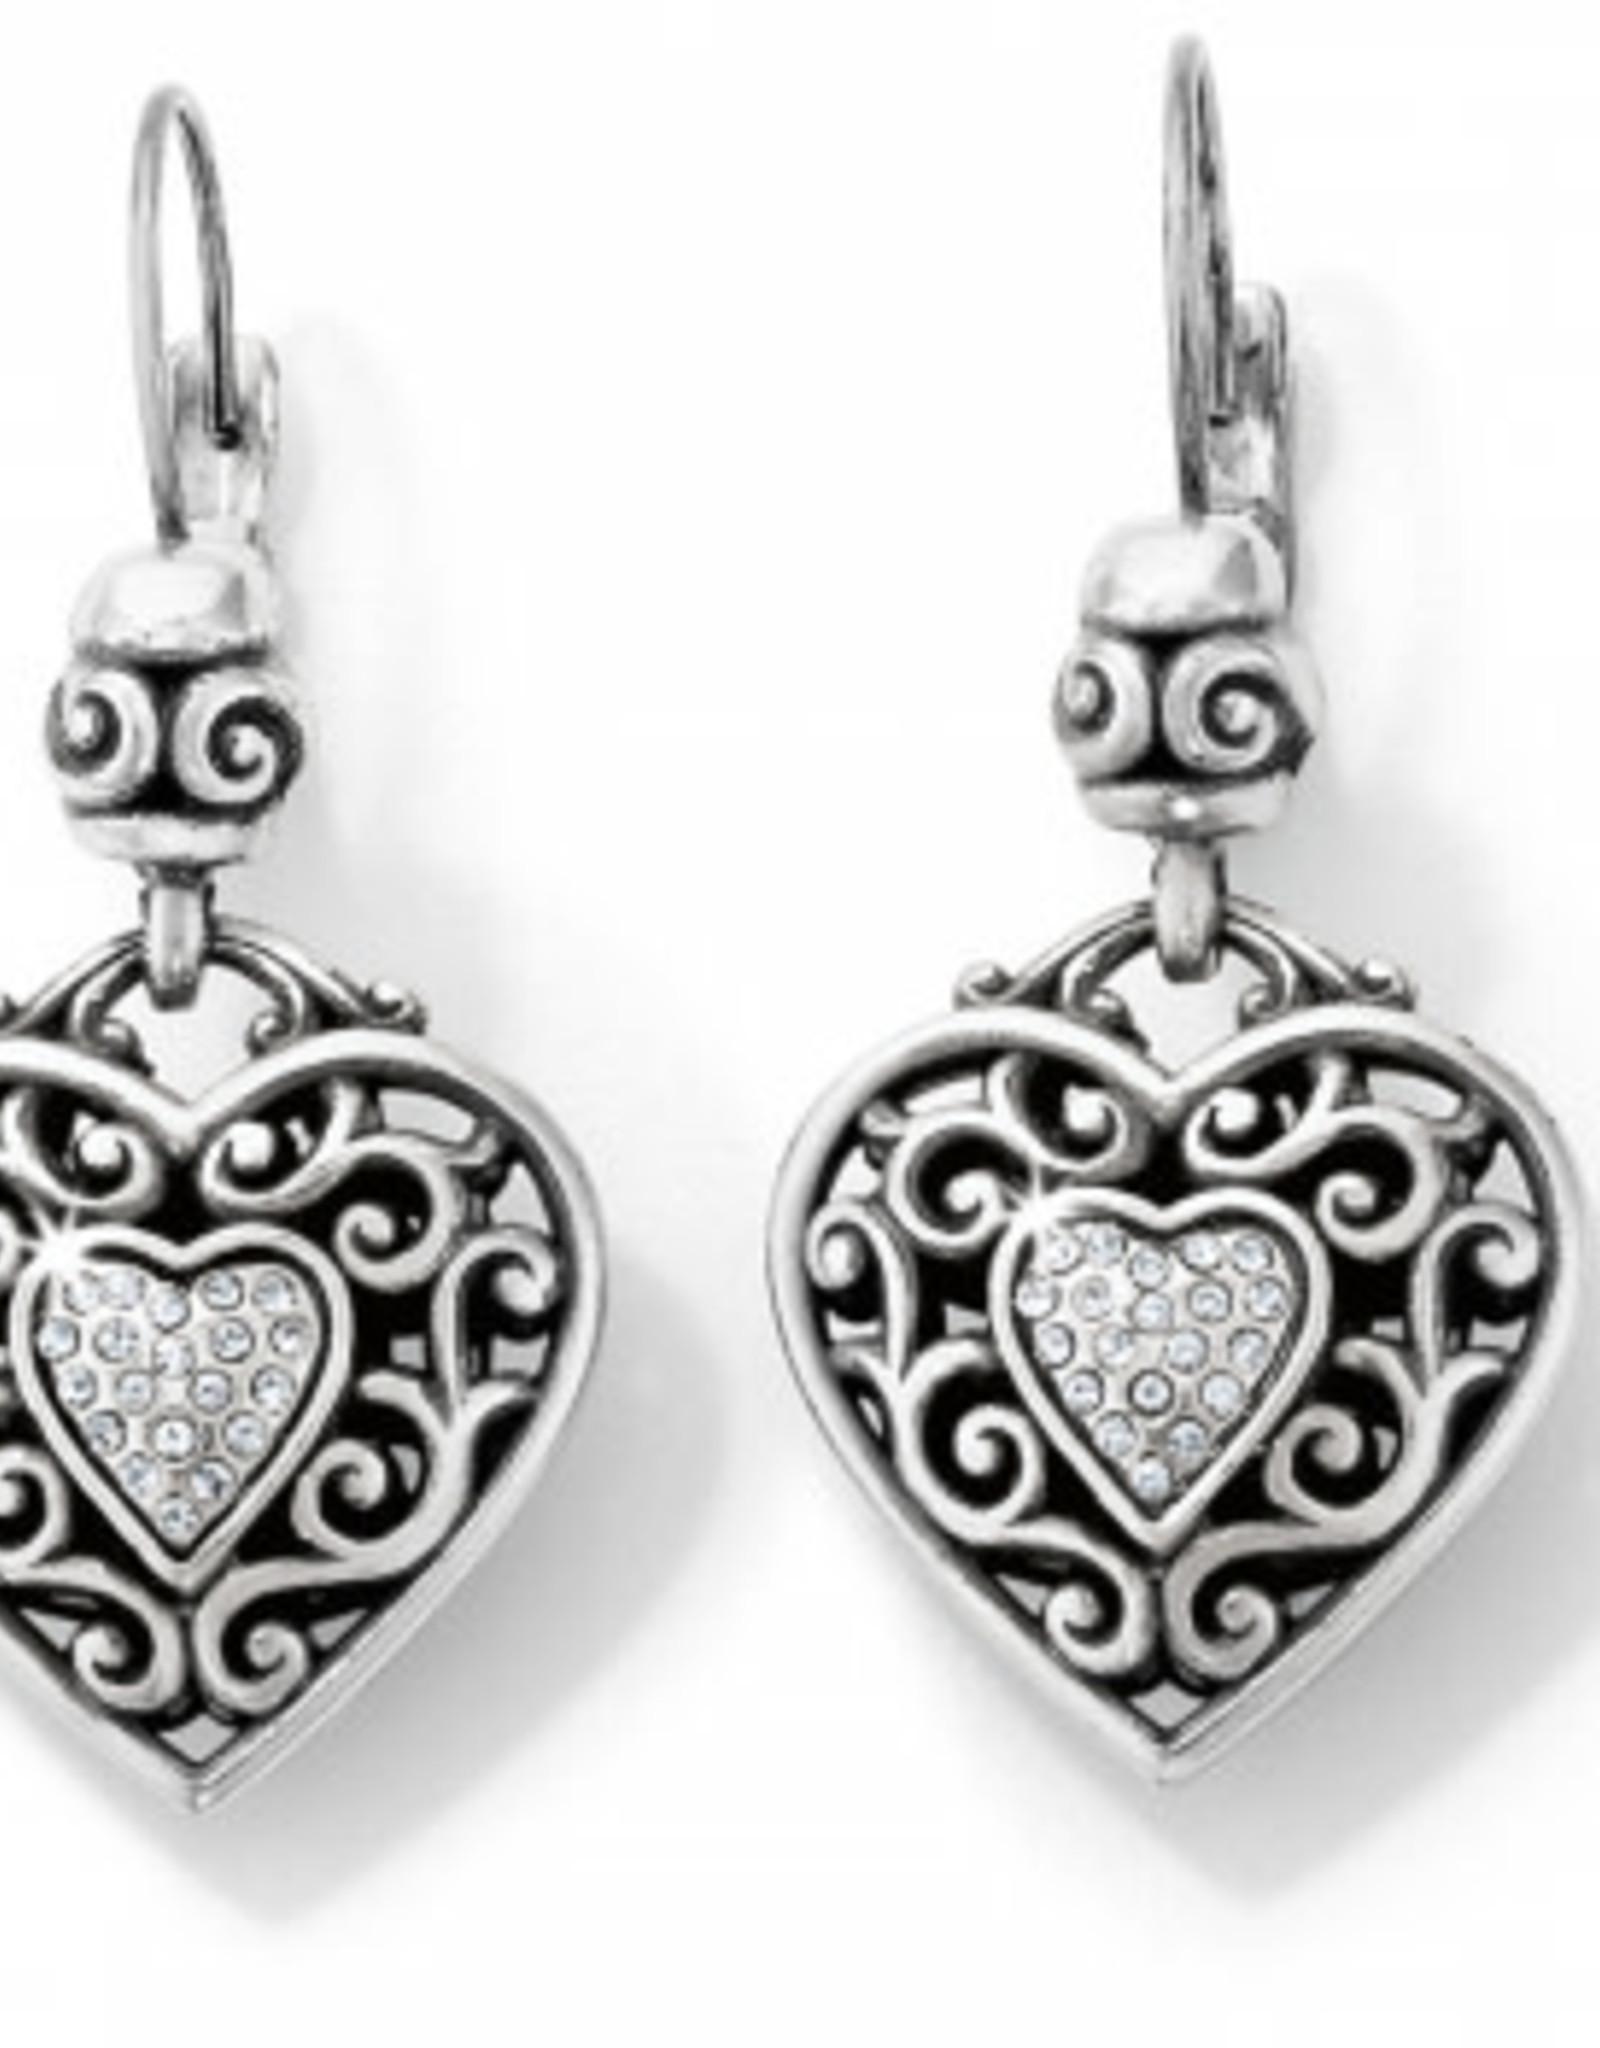 Brighton Brighton, Reno Heart Earrings